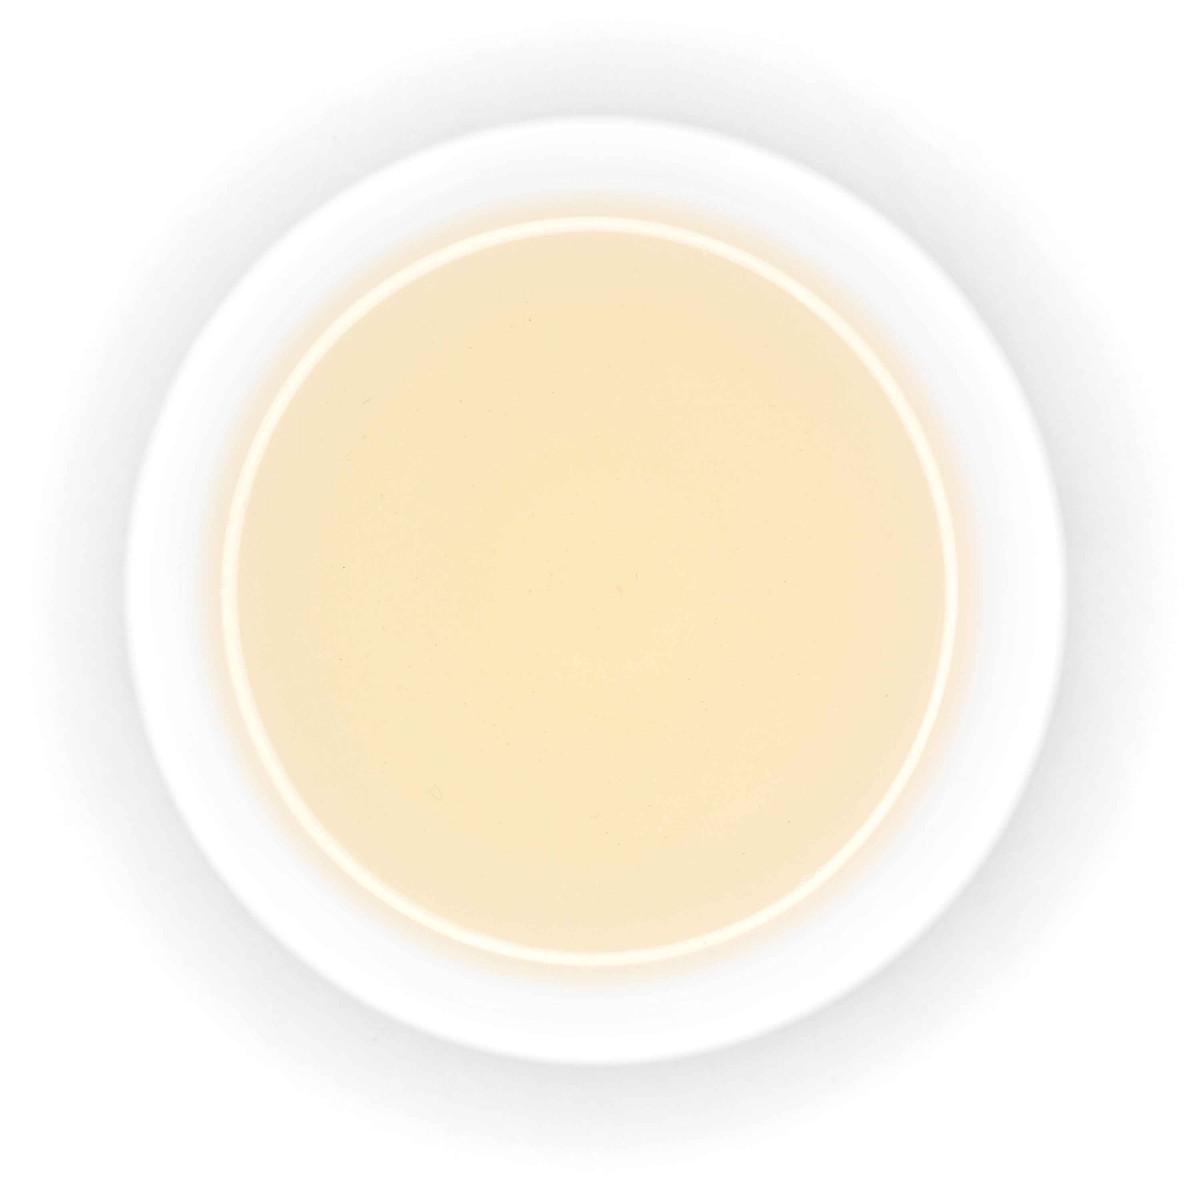 Perfect Day - aromatisierter Weißtee - Style Caddy 100g